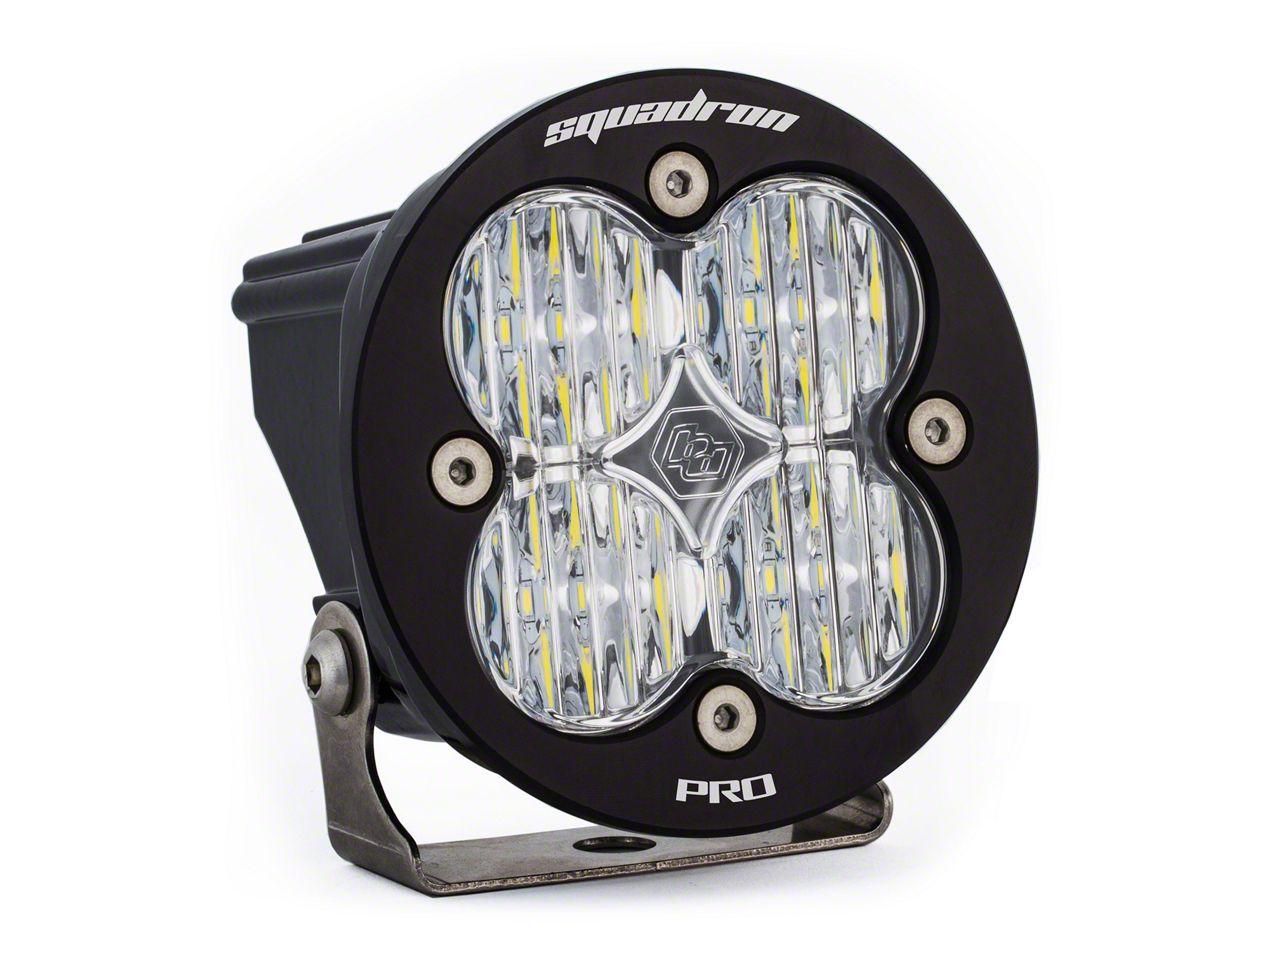 Baja Designs Squadron-R Pro LED Light - Wide Cornering Beam